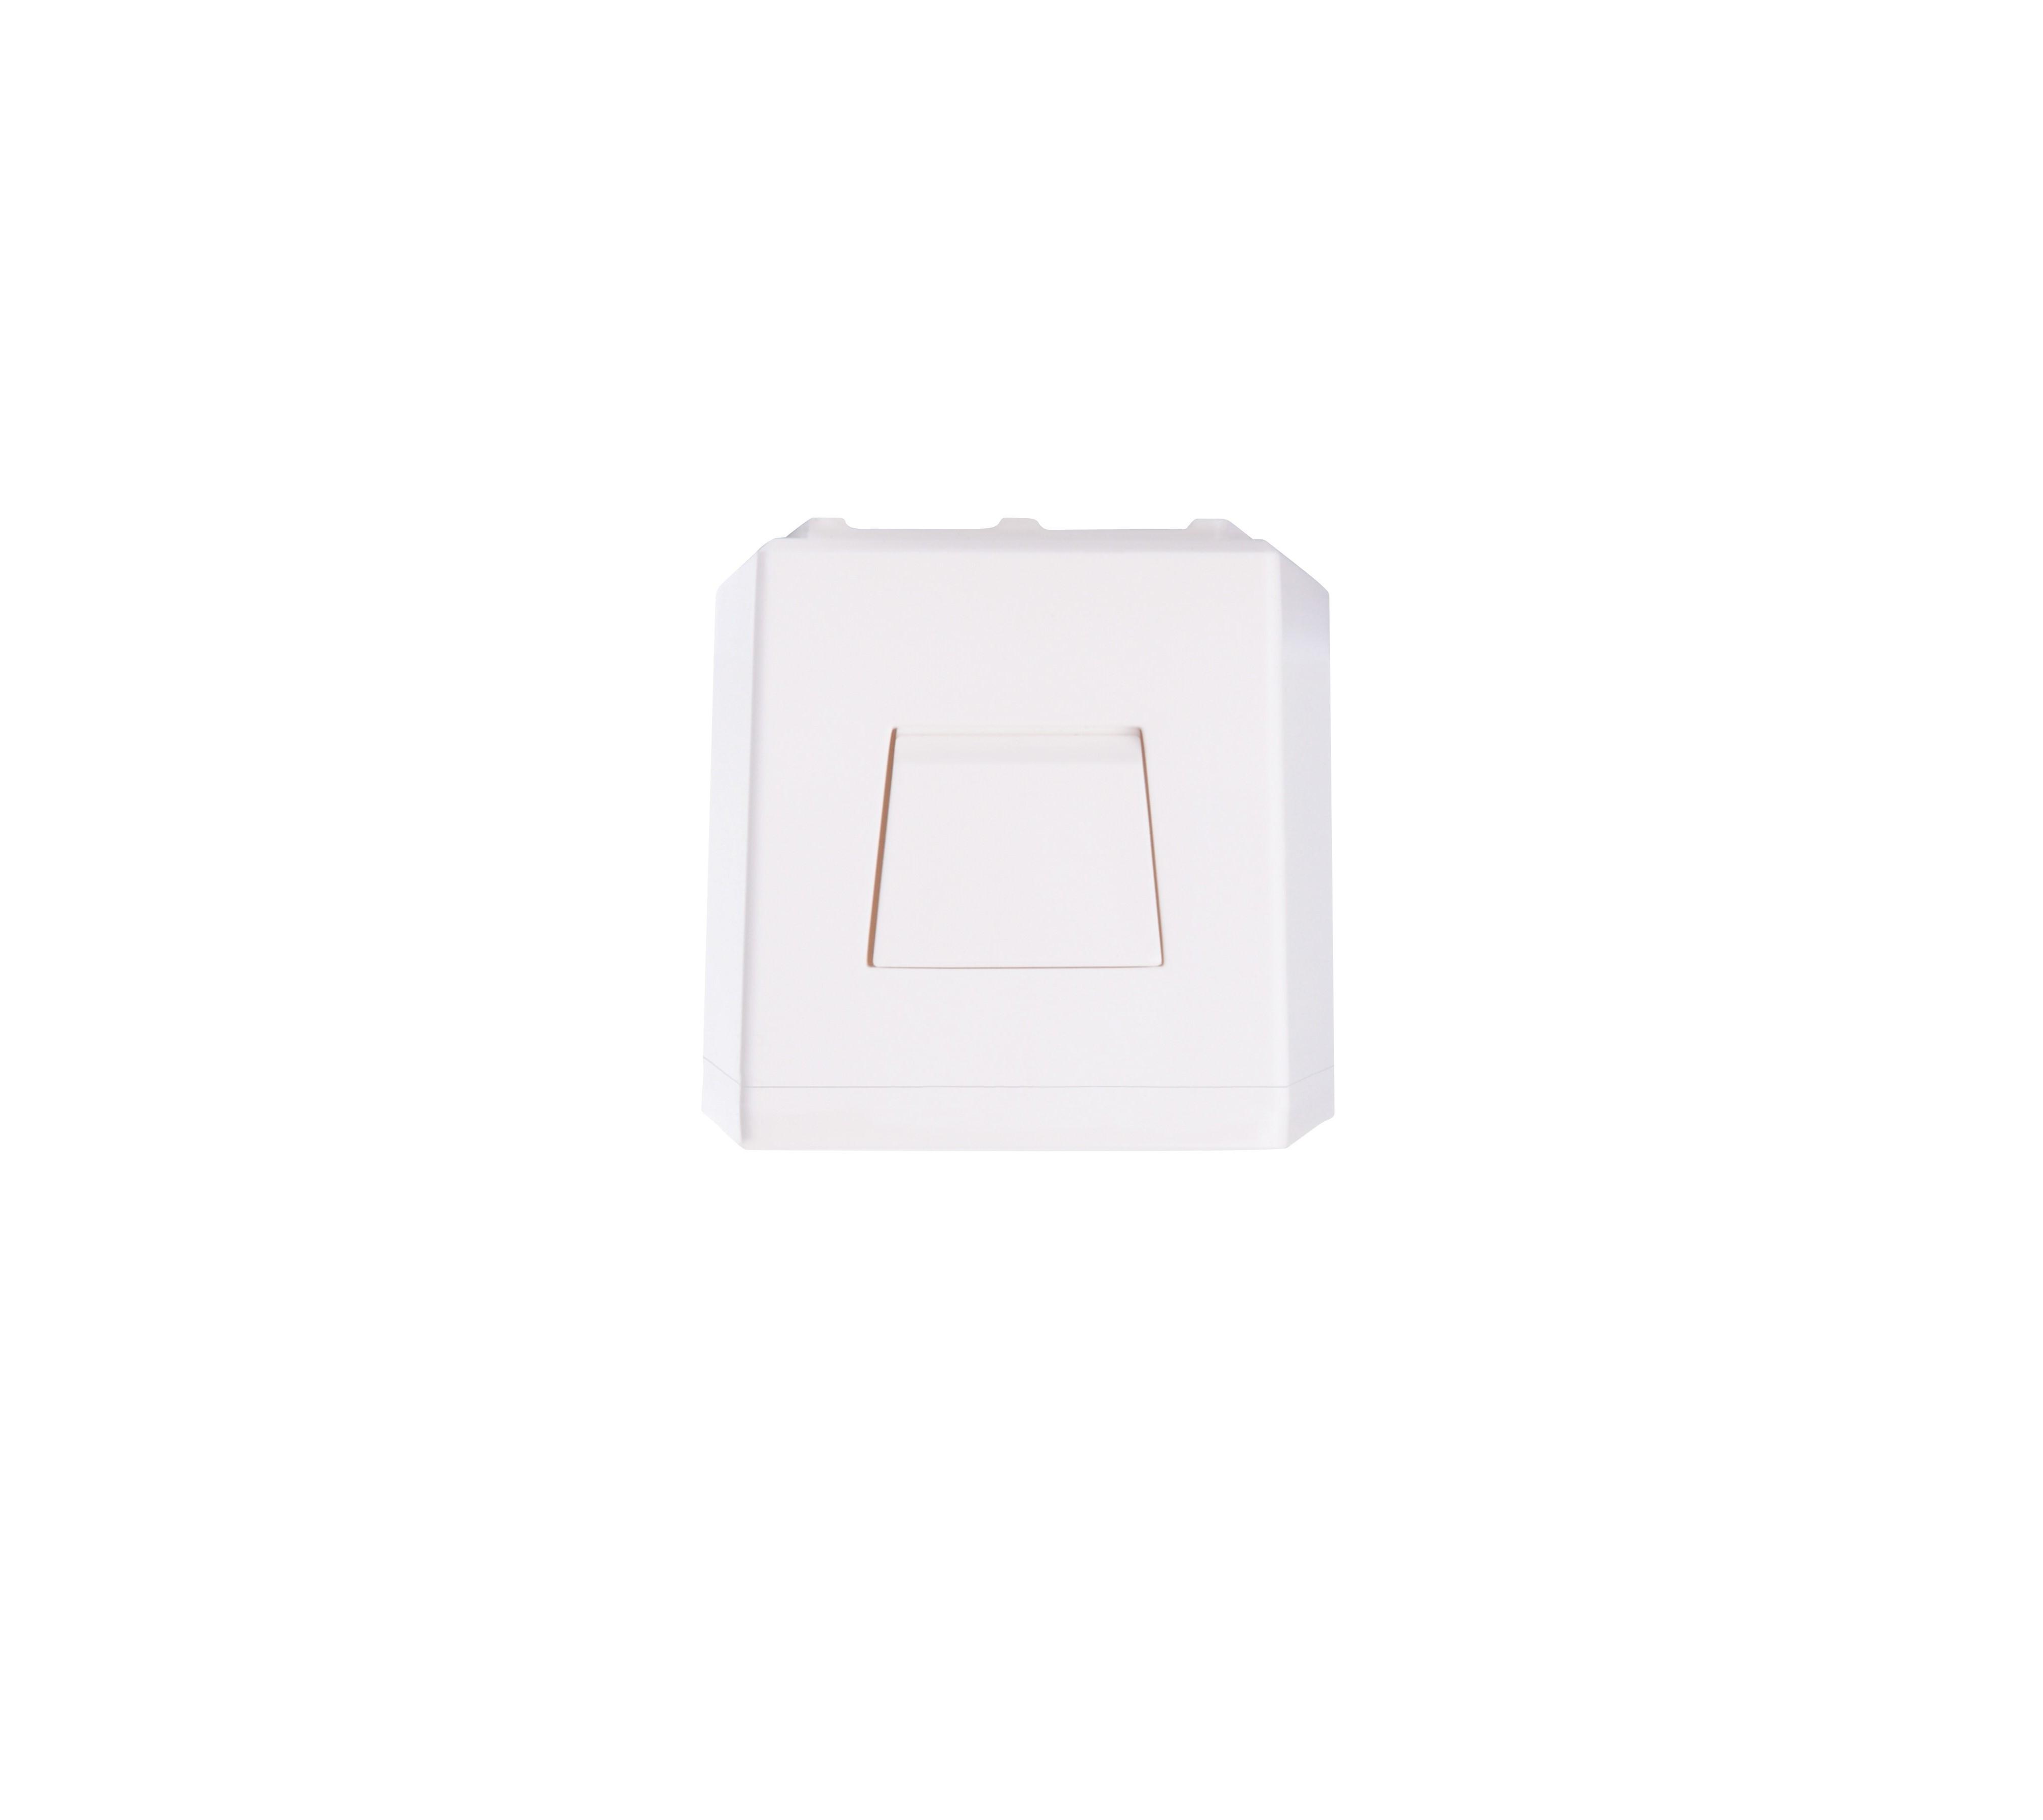 Lampa emergenta led Intelight 94658   3h mentinut test automat1